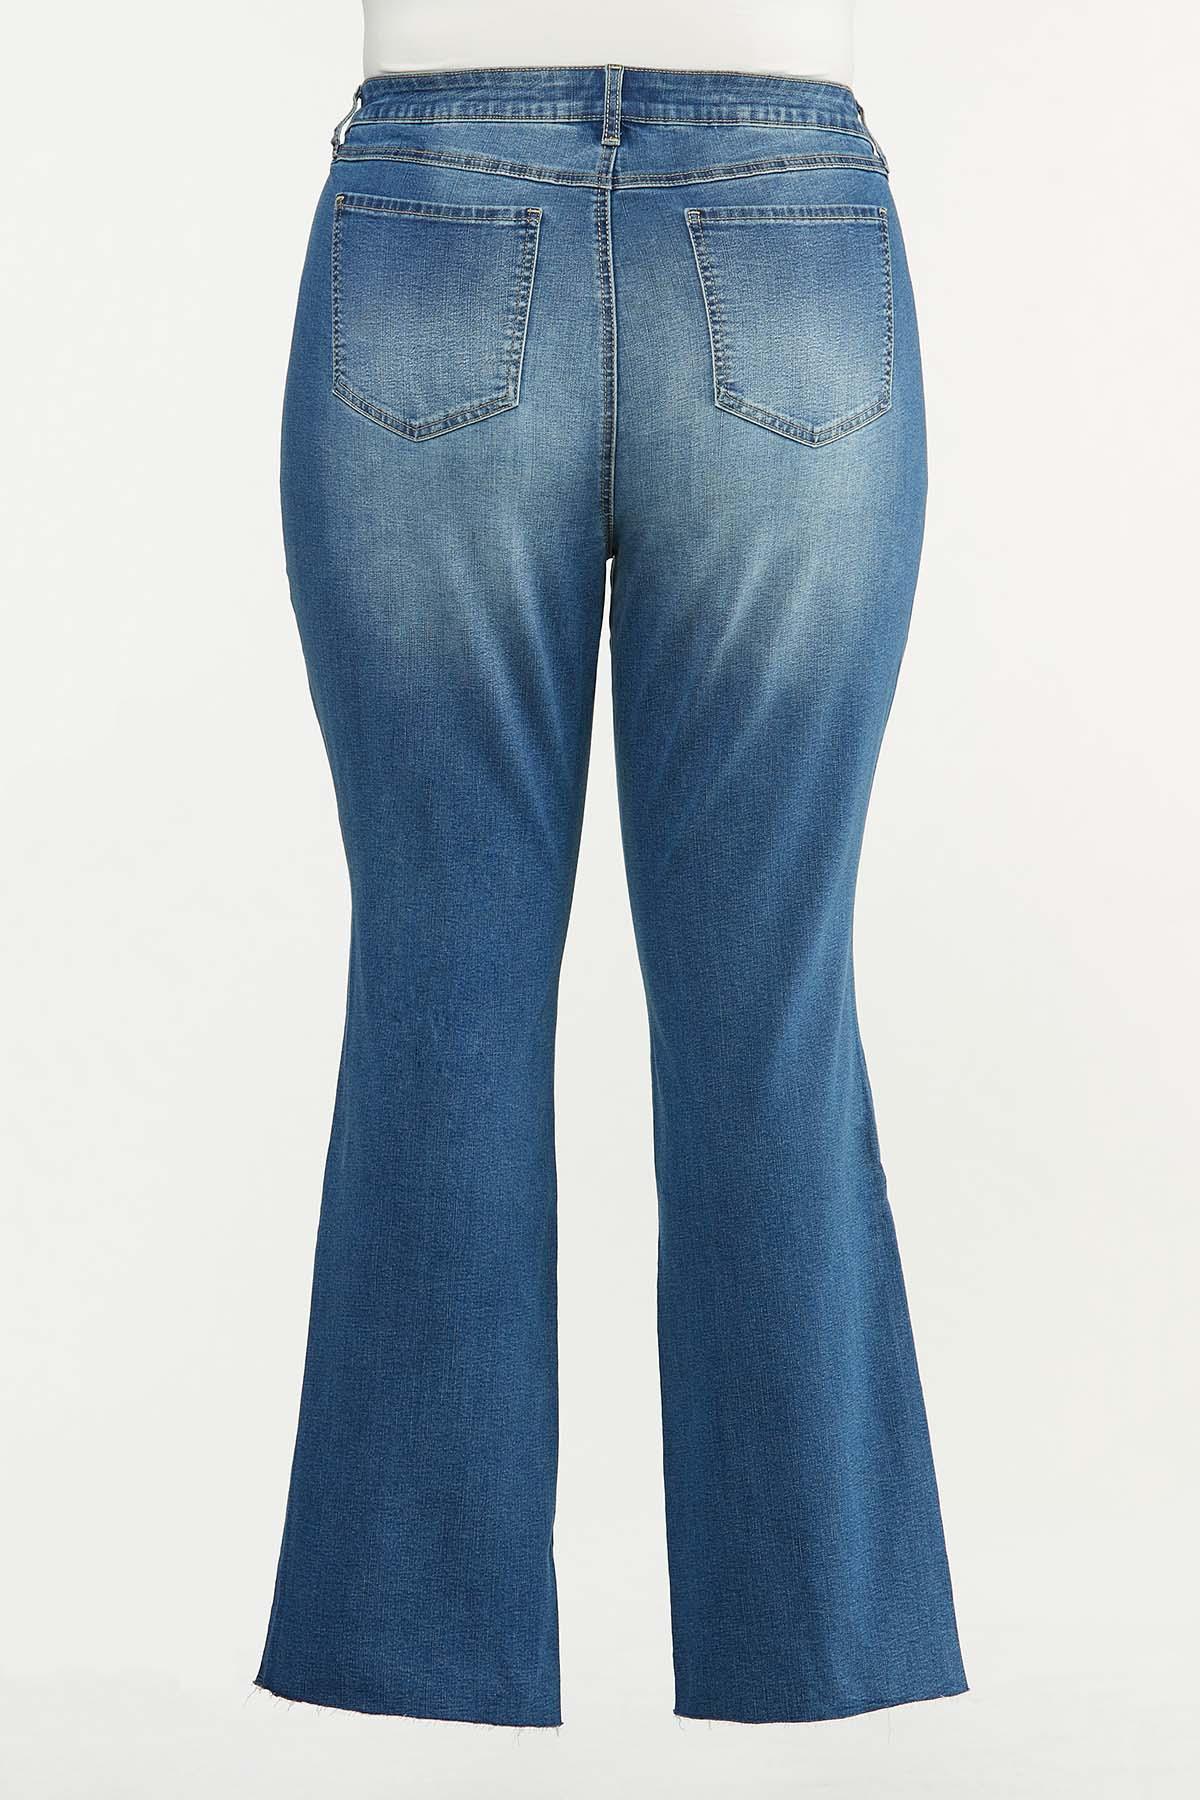 Plus Petite Bootcut Raw Hem Jeans (Item #44659189)